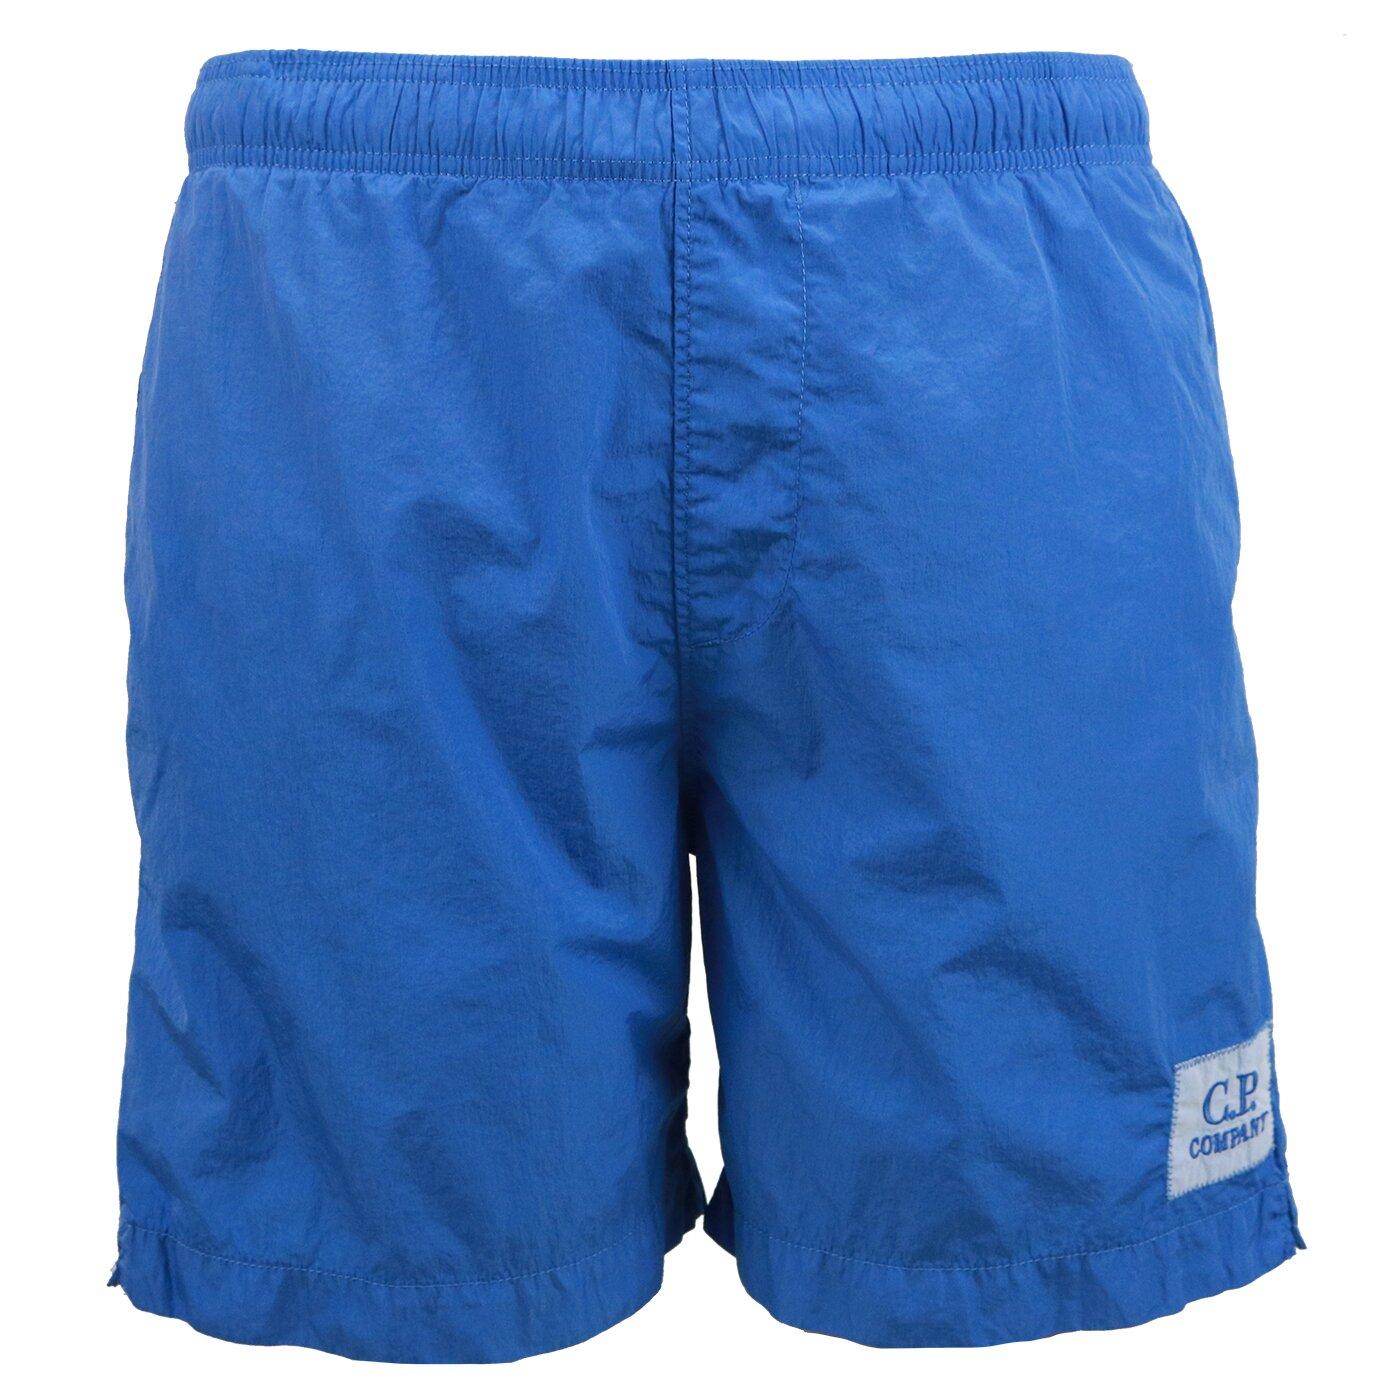 CP Company Beach Short Riviera blue